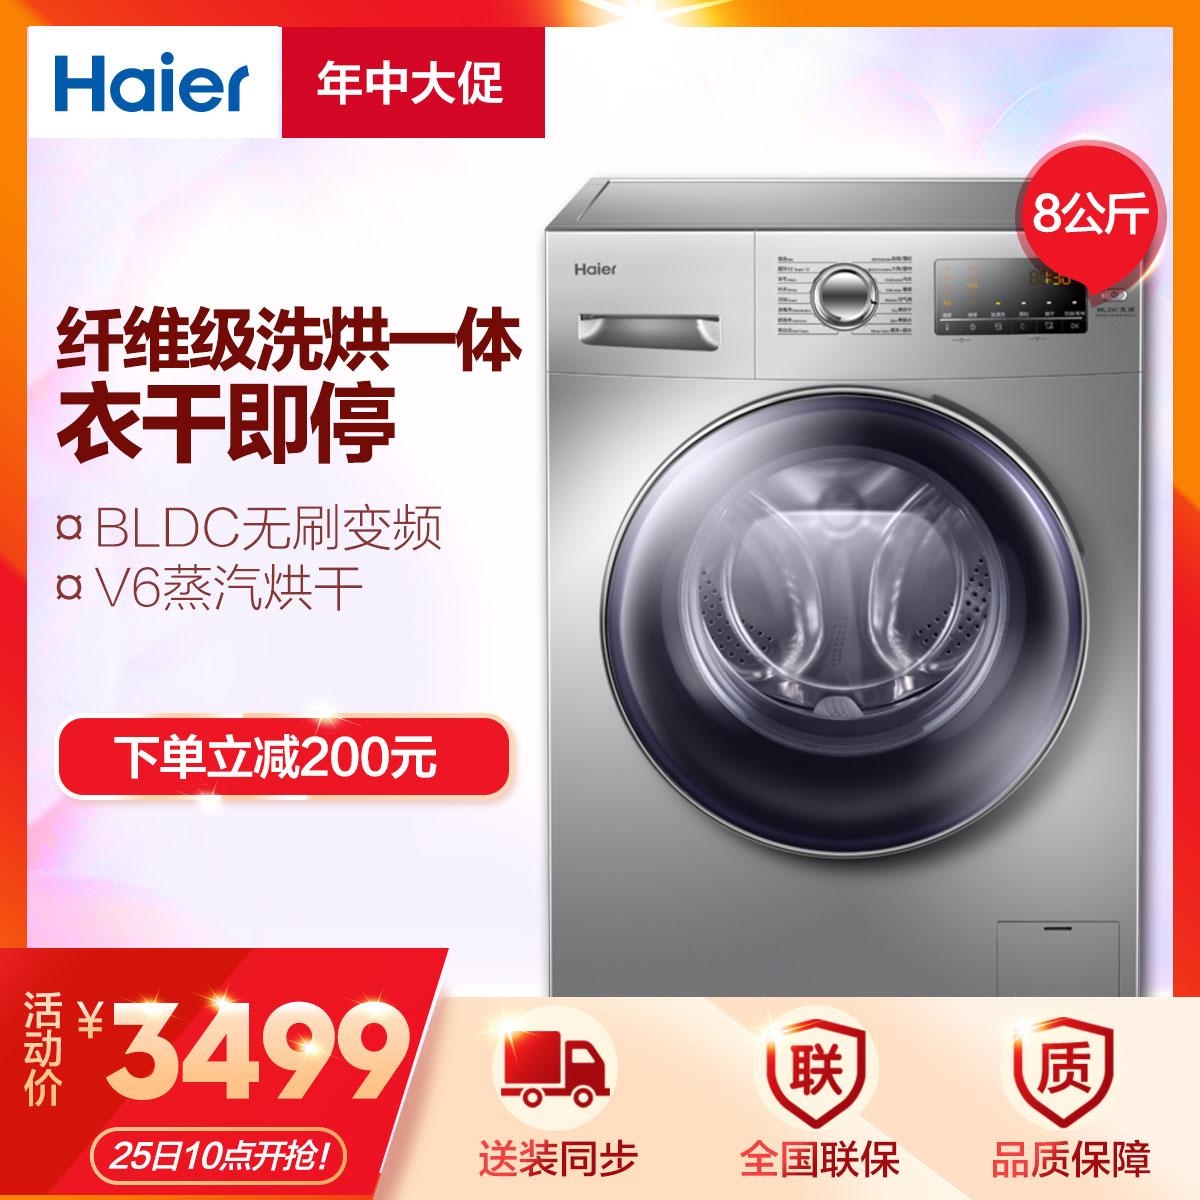 EG8014HB919SU1 8公斤变频洗烘一体滚筒洗衣机